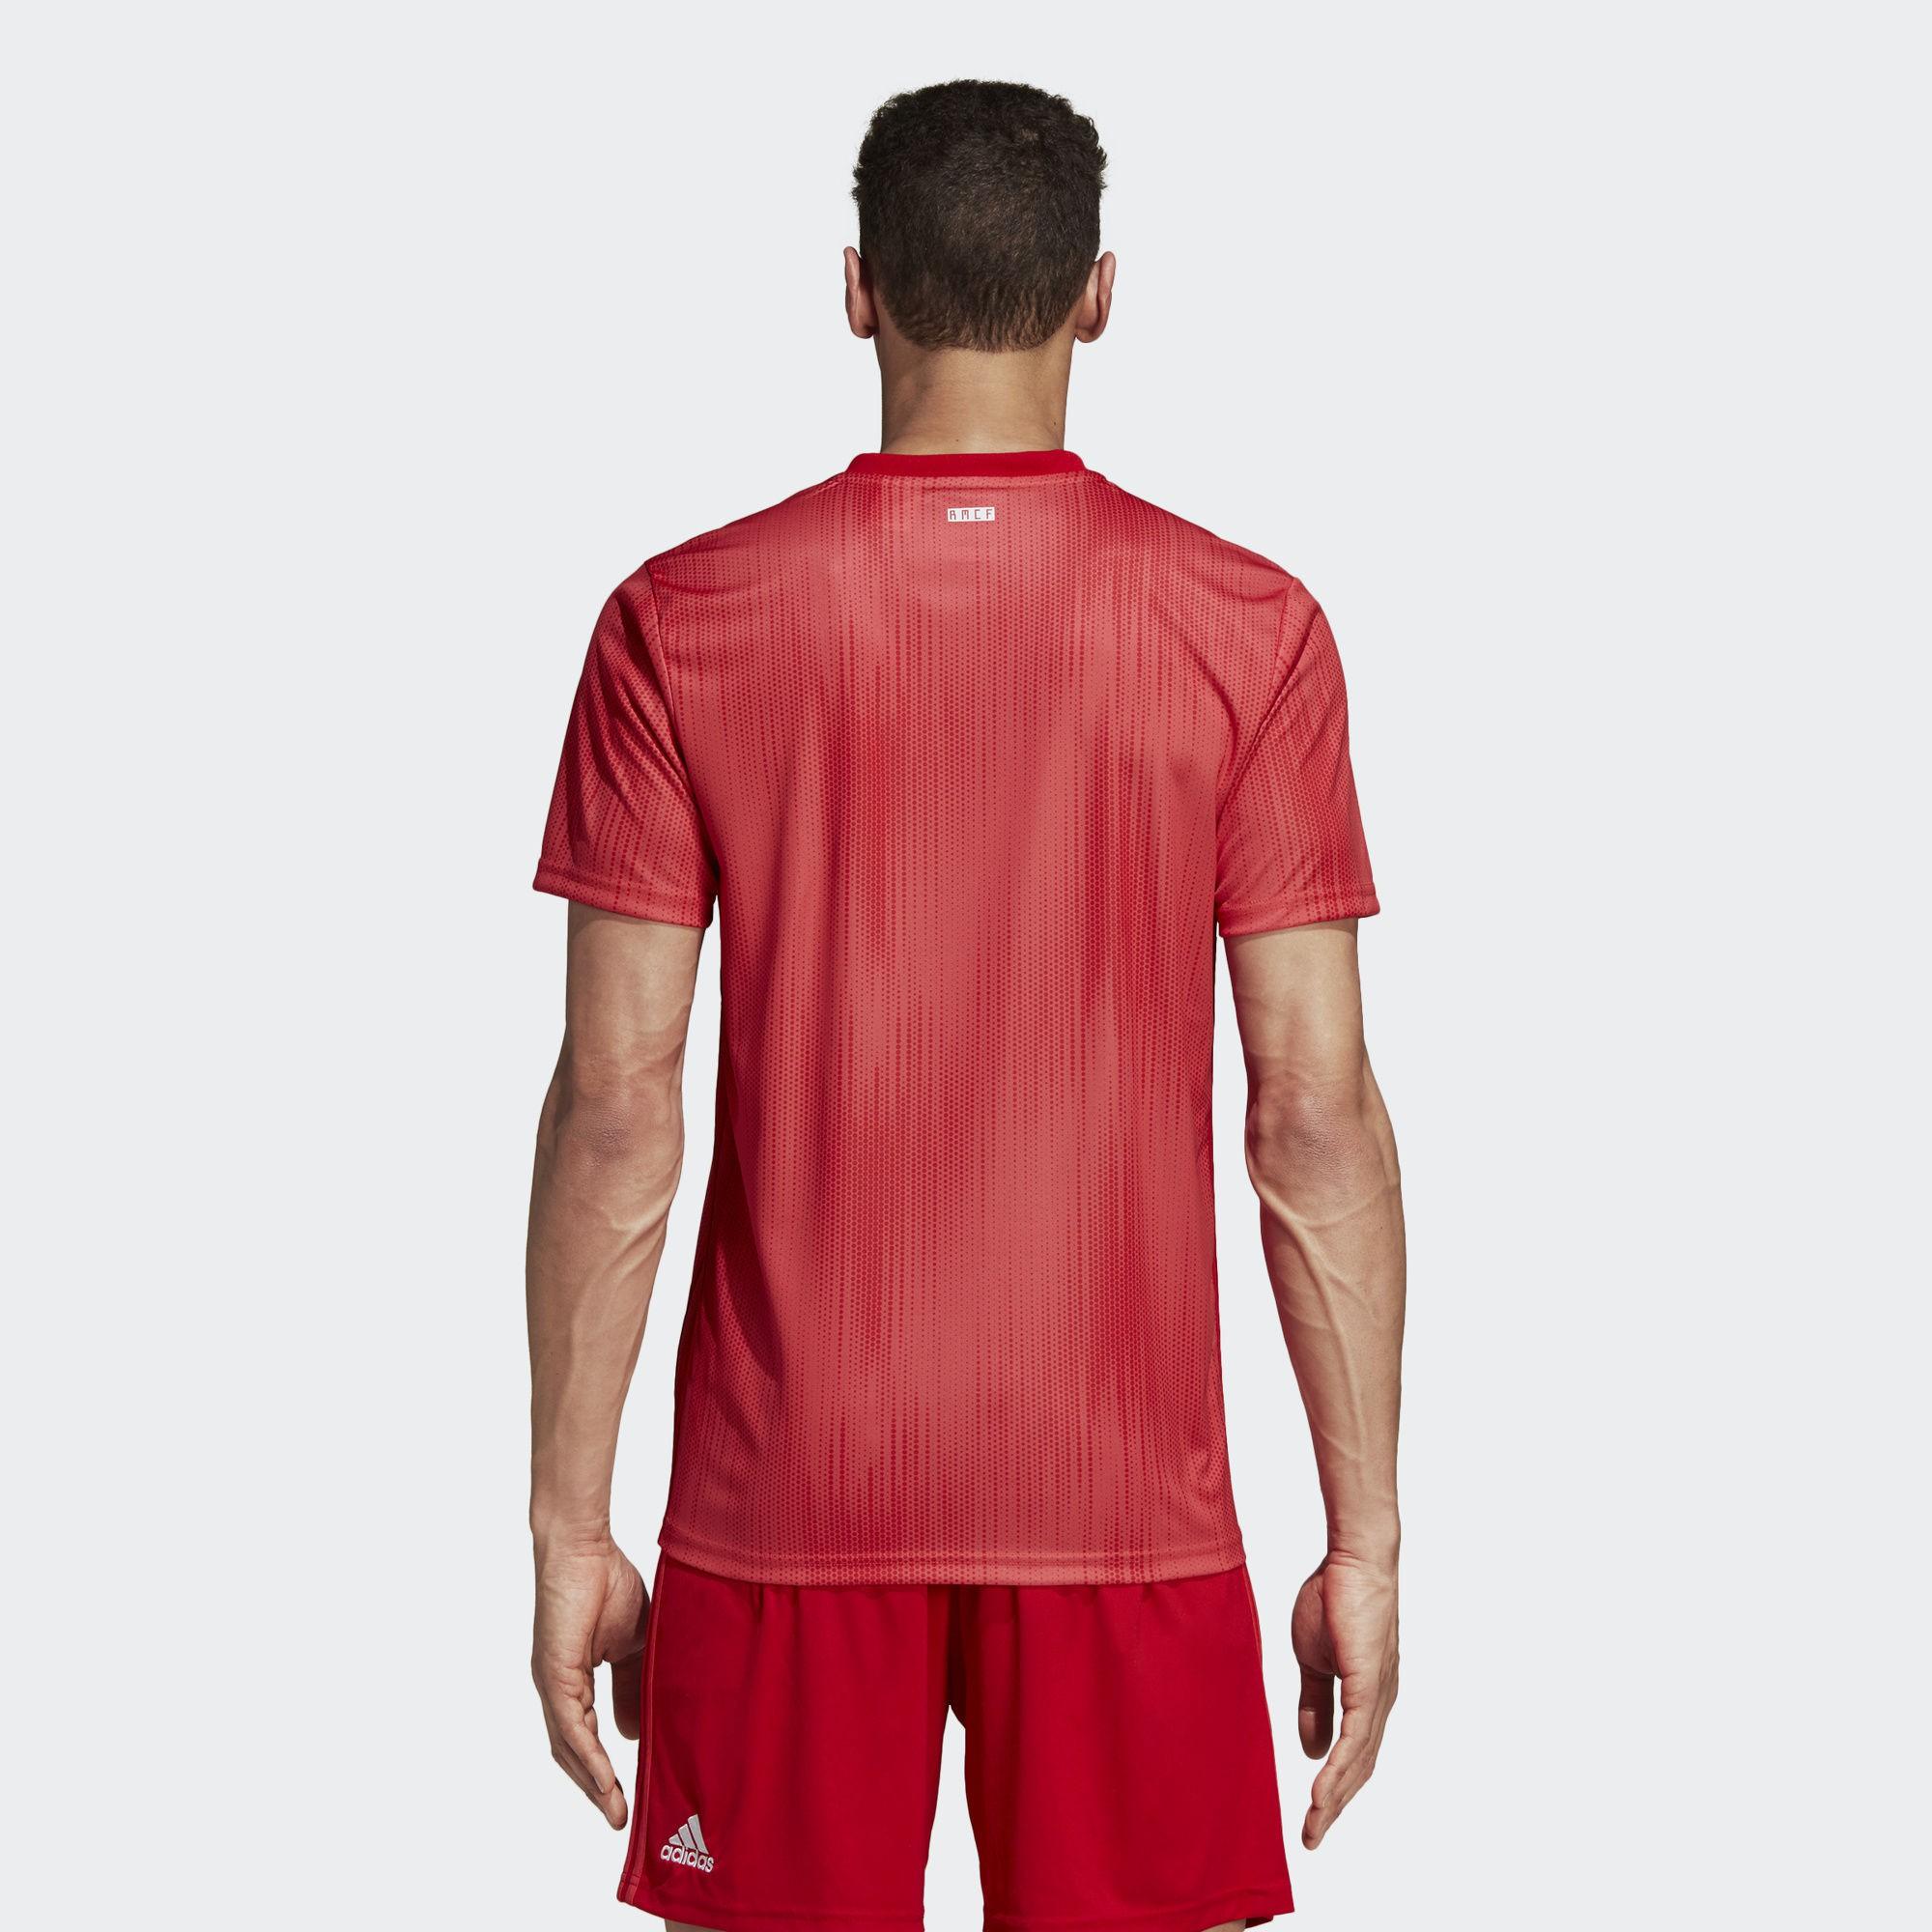 deb109460455f Camiseta Fútbol Adidas Real Madrid 3ª 2018 19 Roja Hombre - Deportes Moya